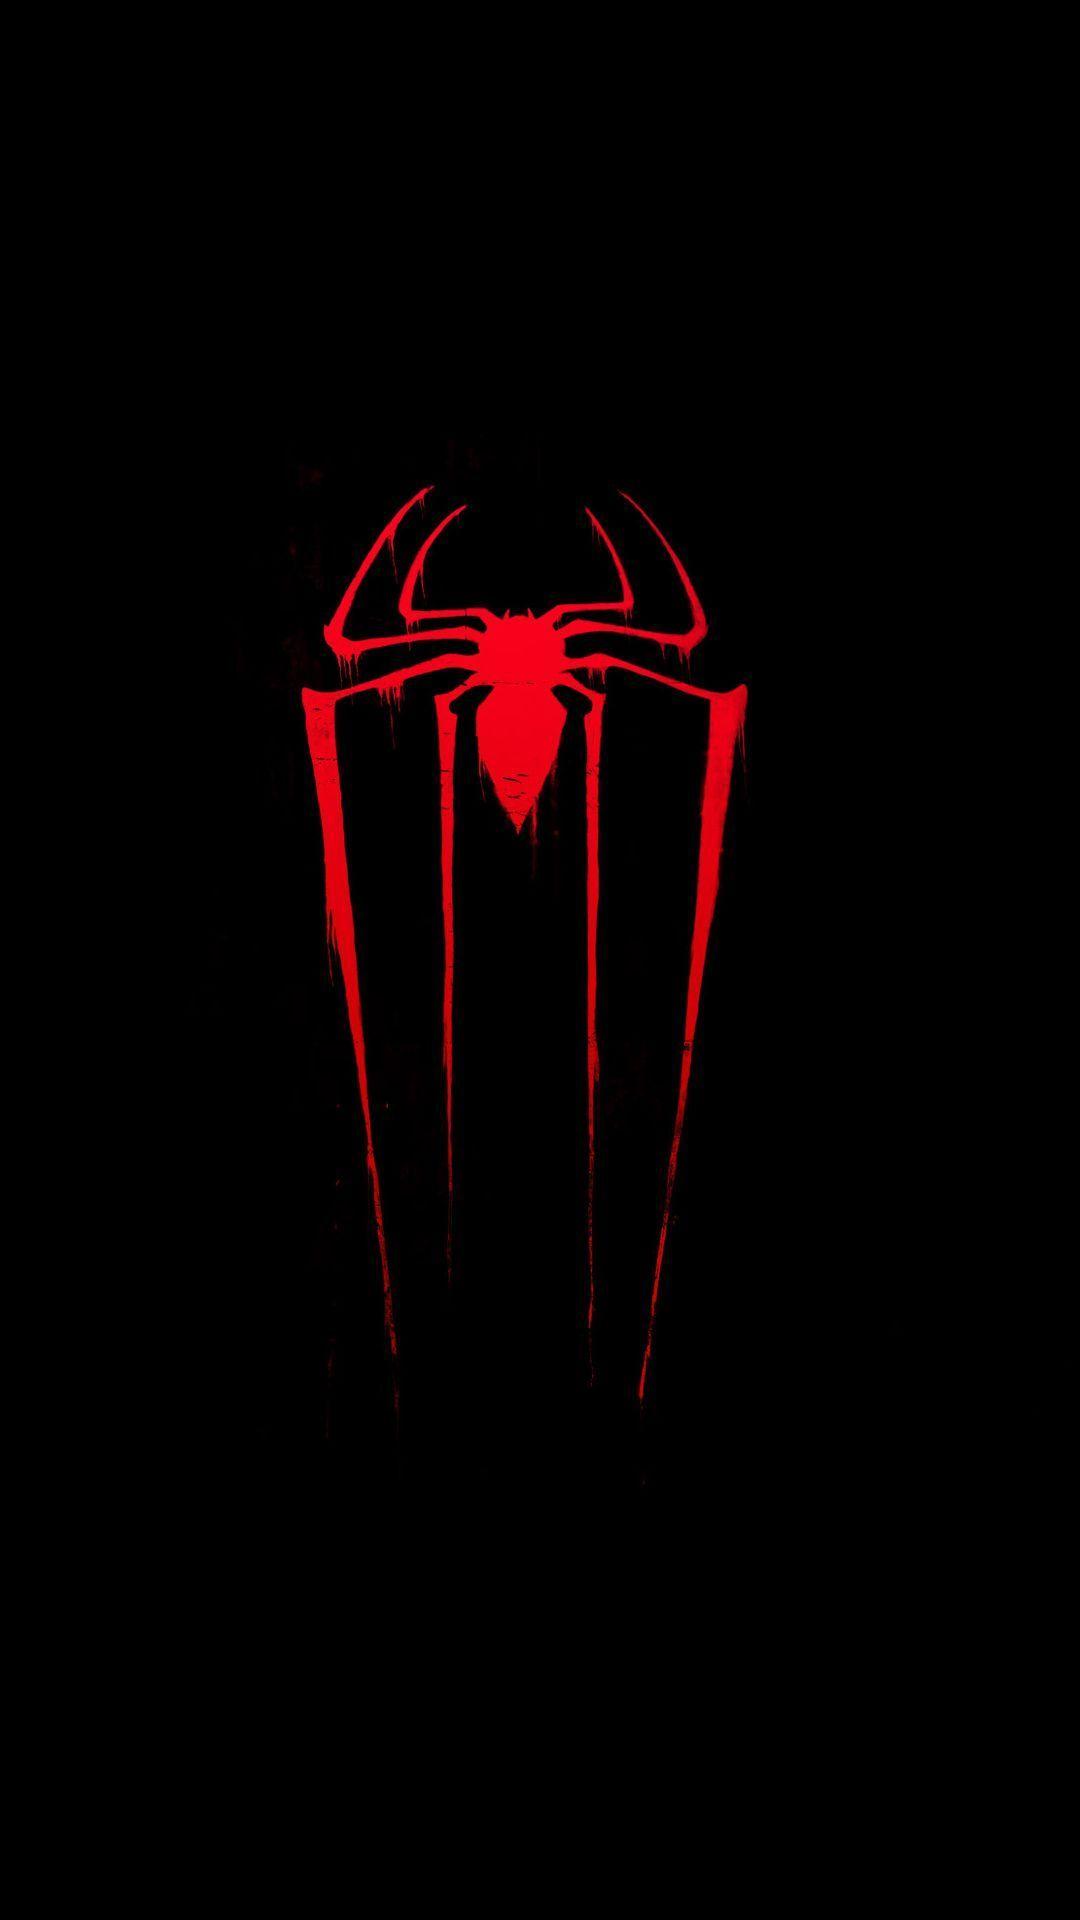 Spider Man Hd Wallpaper For Mobile 44931 Superhero Wallpaper